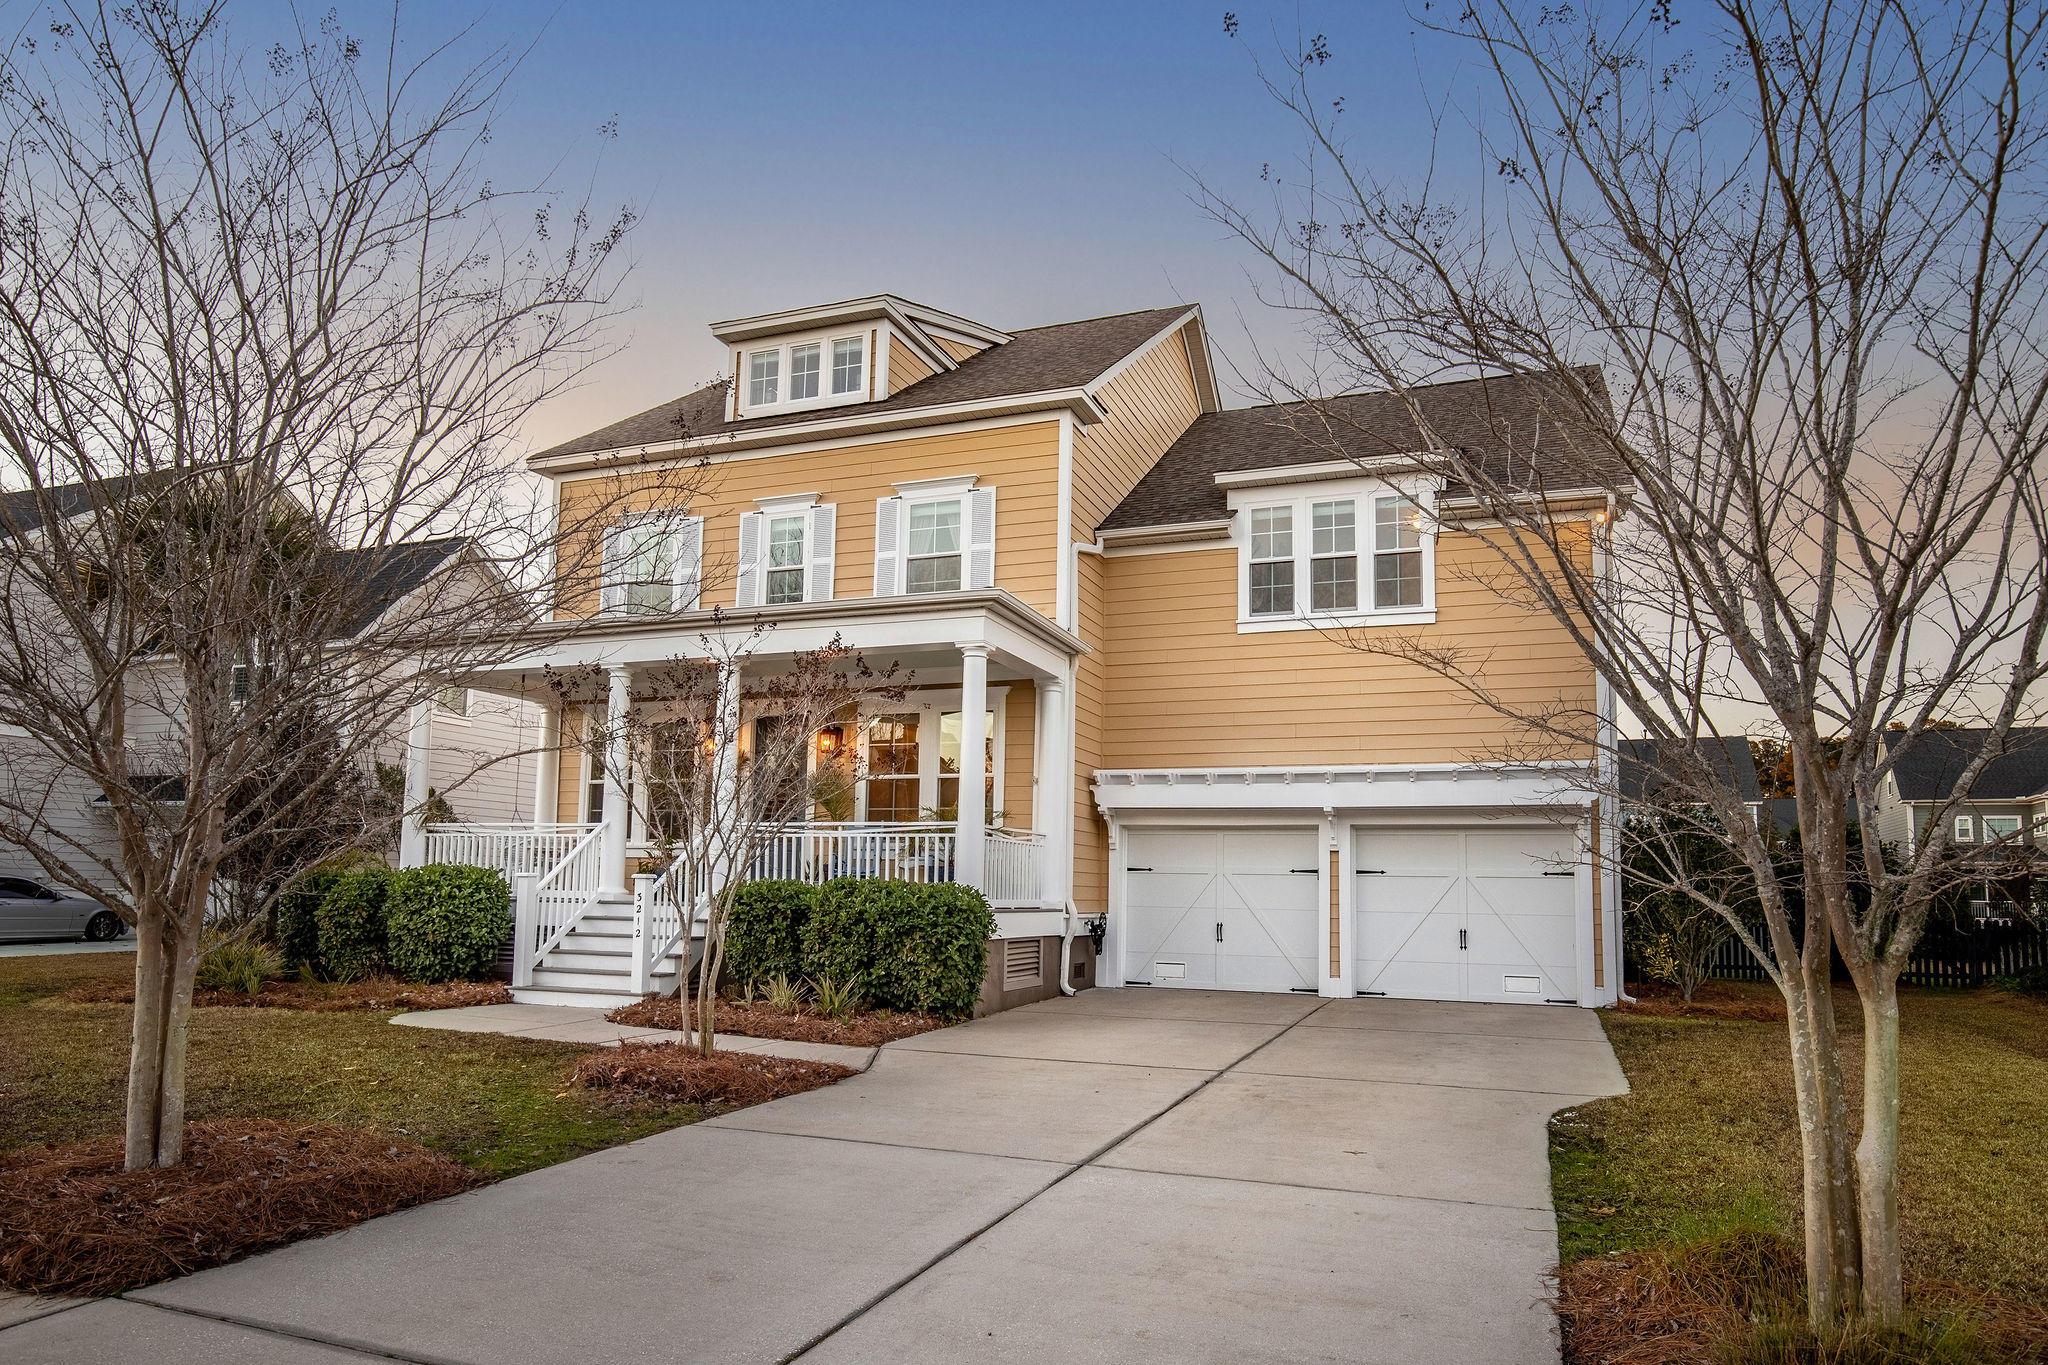 Dunes West Homes For Sale - 3212 Hatchway, Mount Pleasant, SC - 13